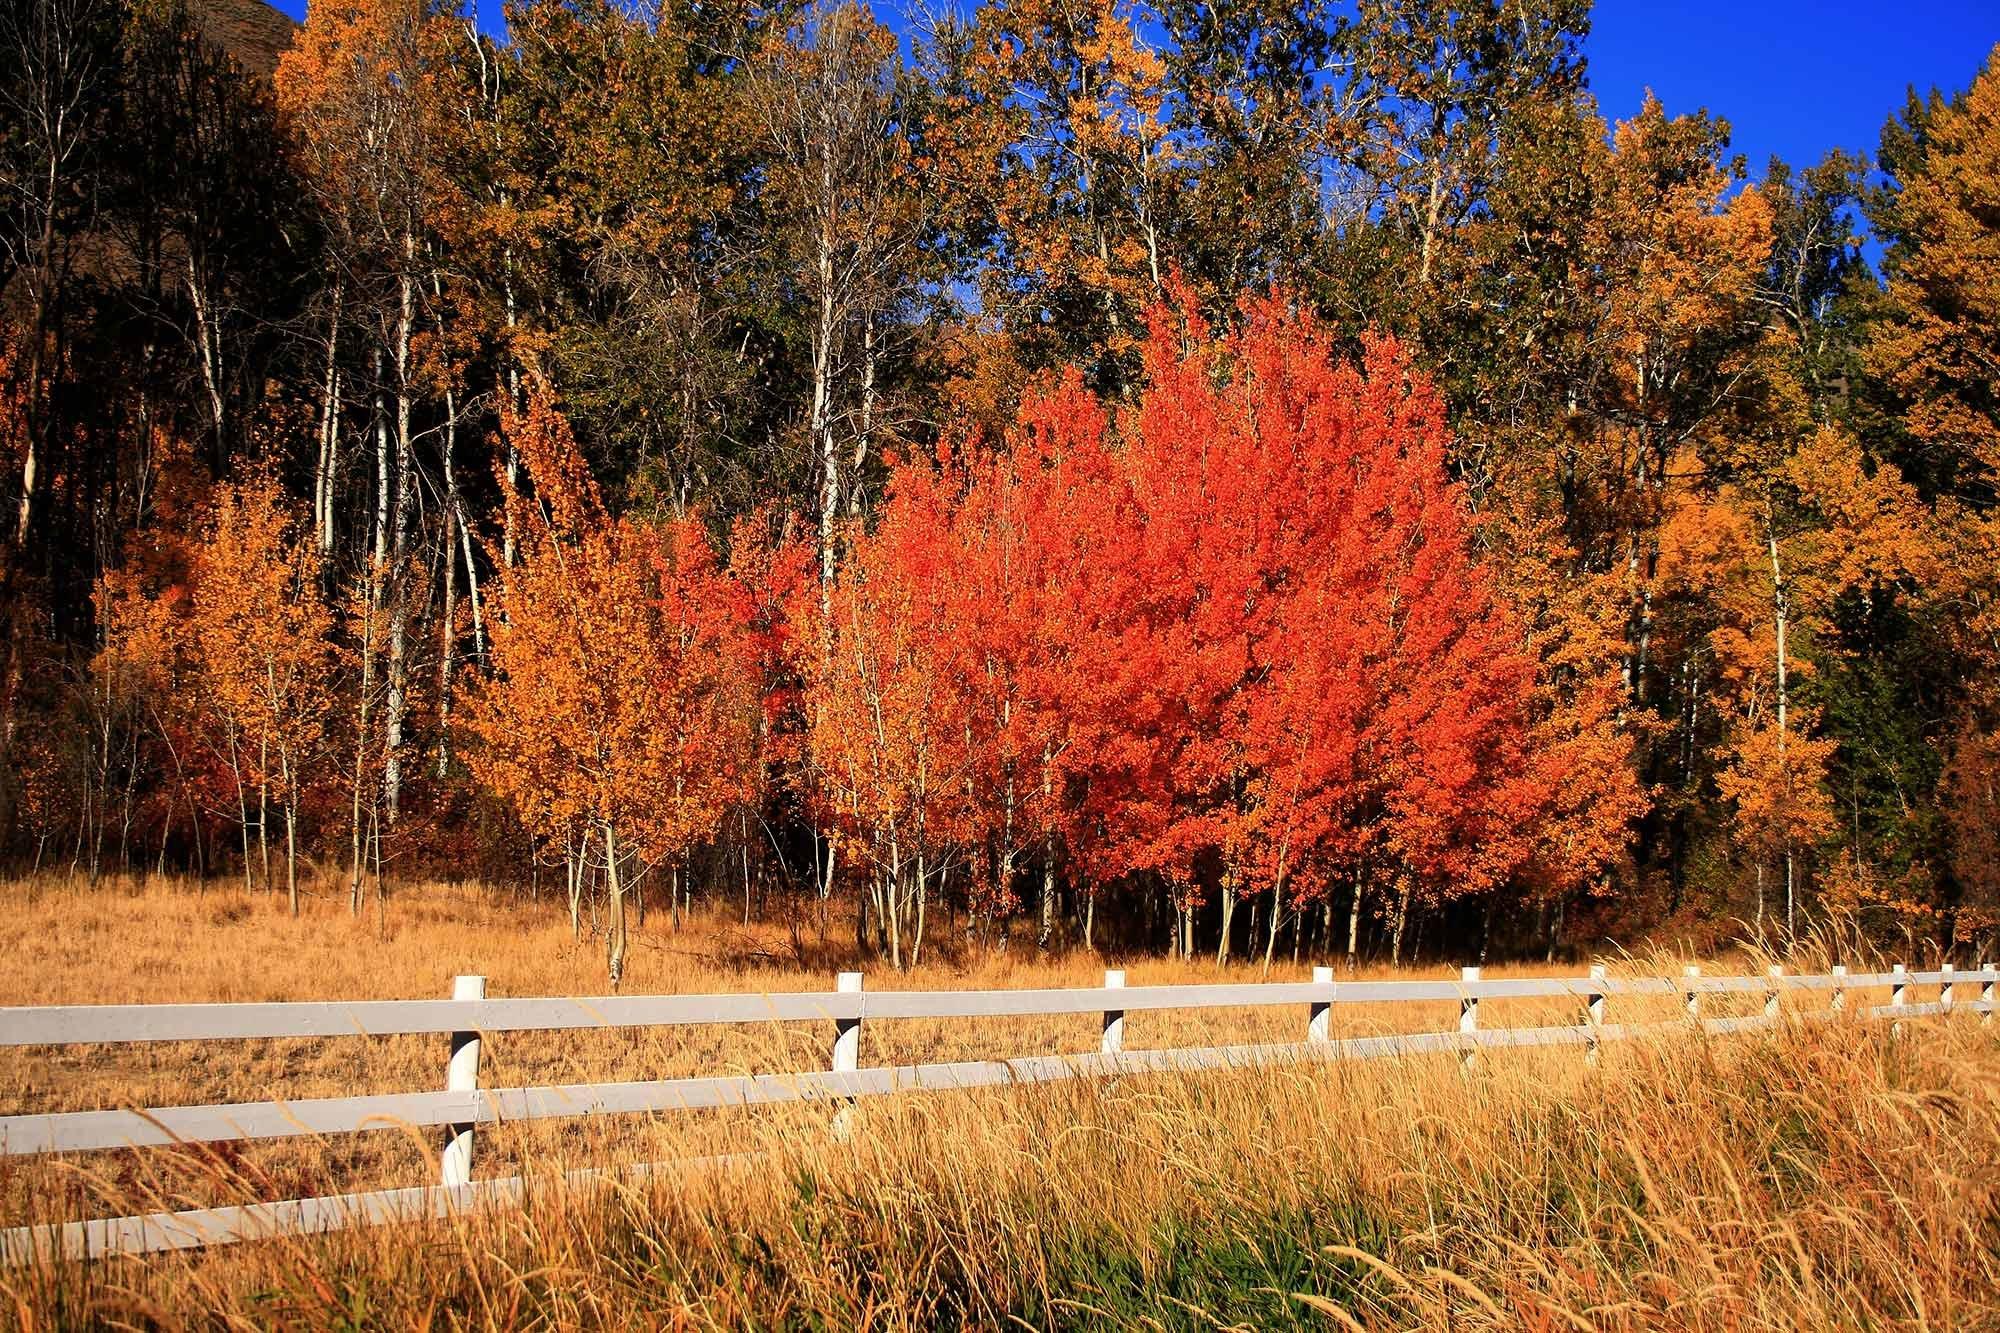 Autumn Trees Near Fence